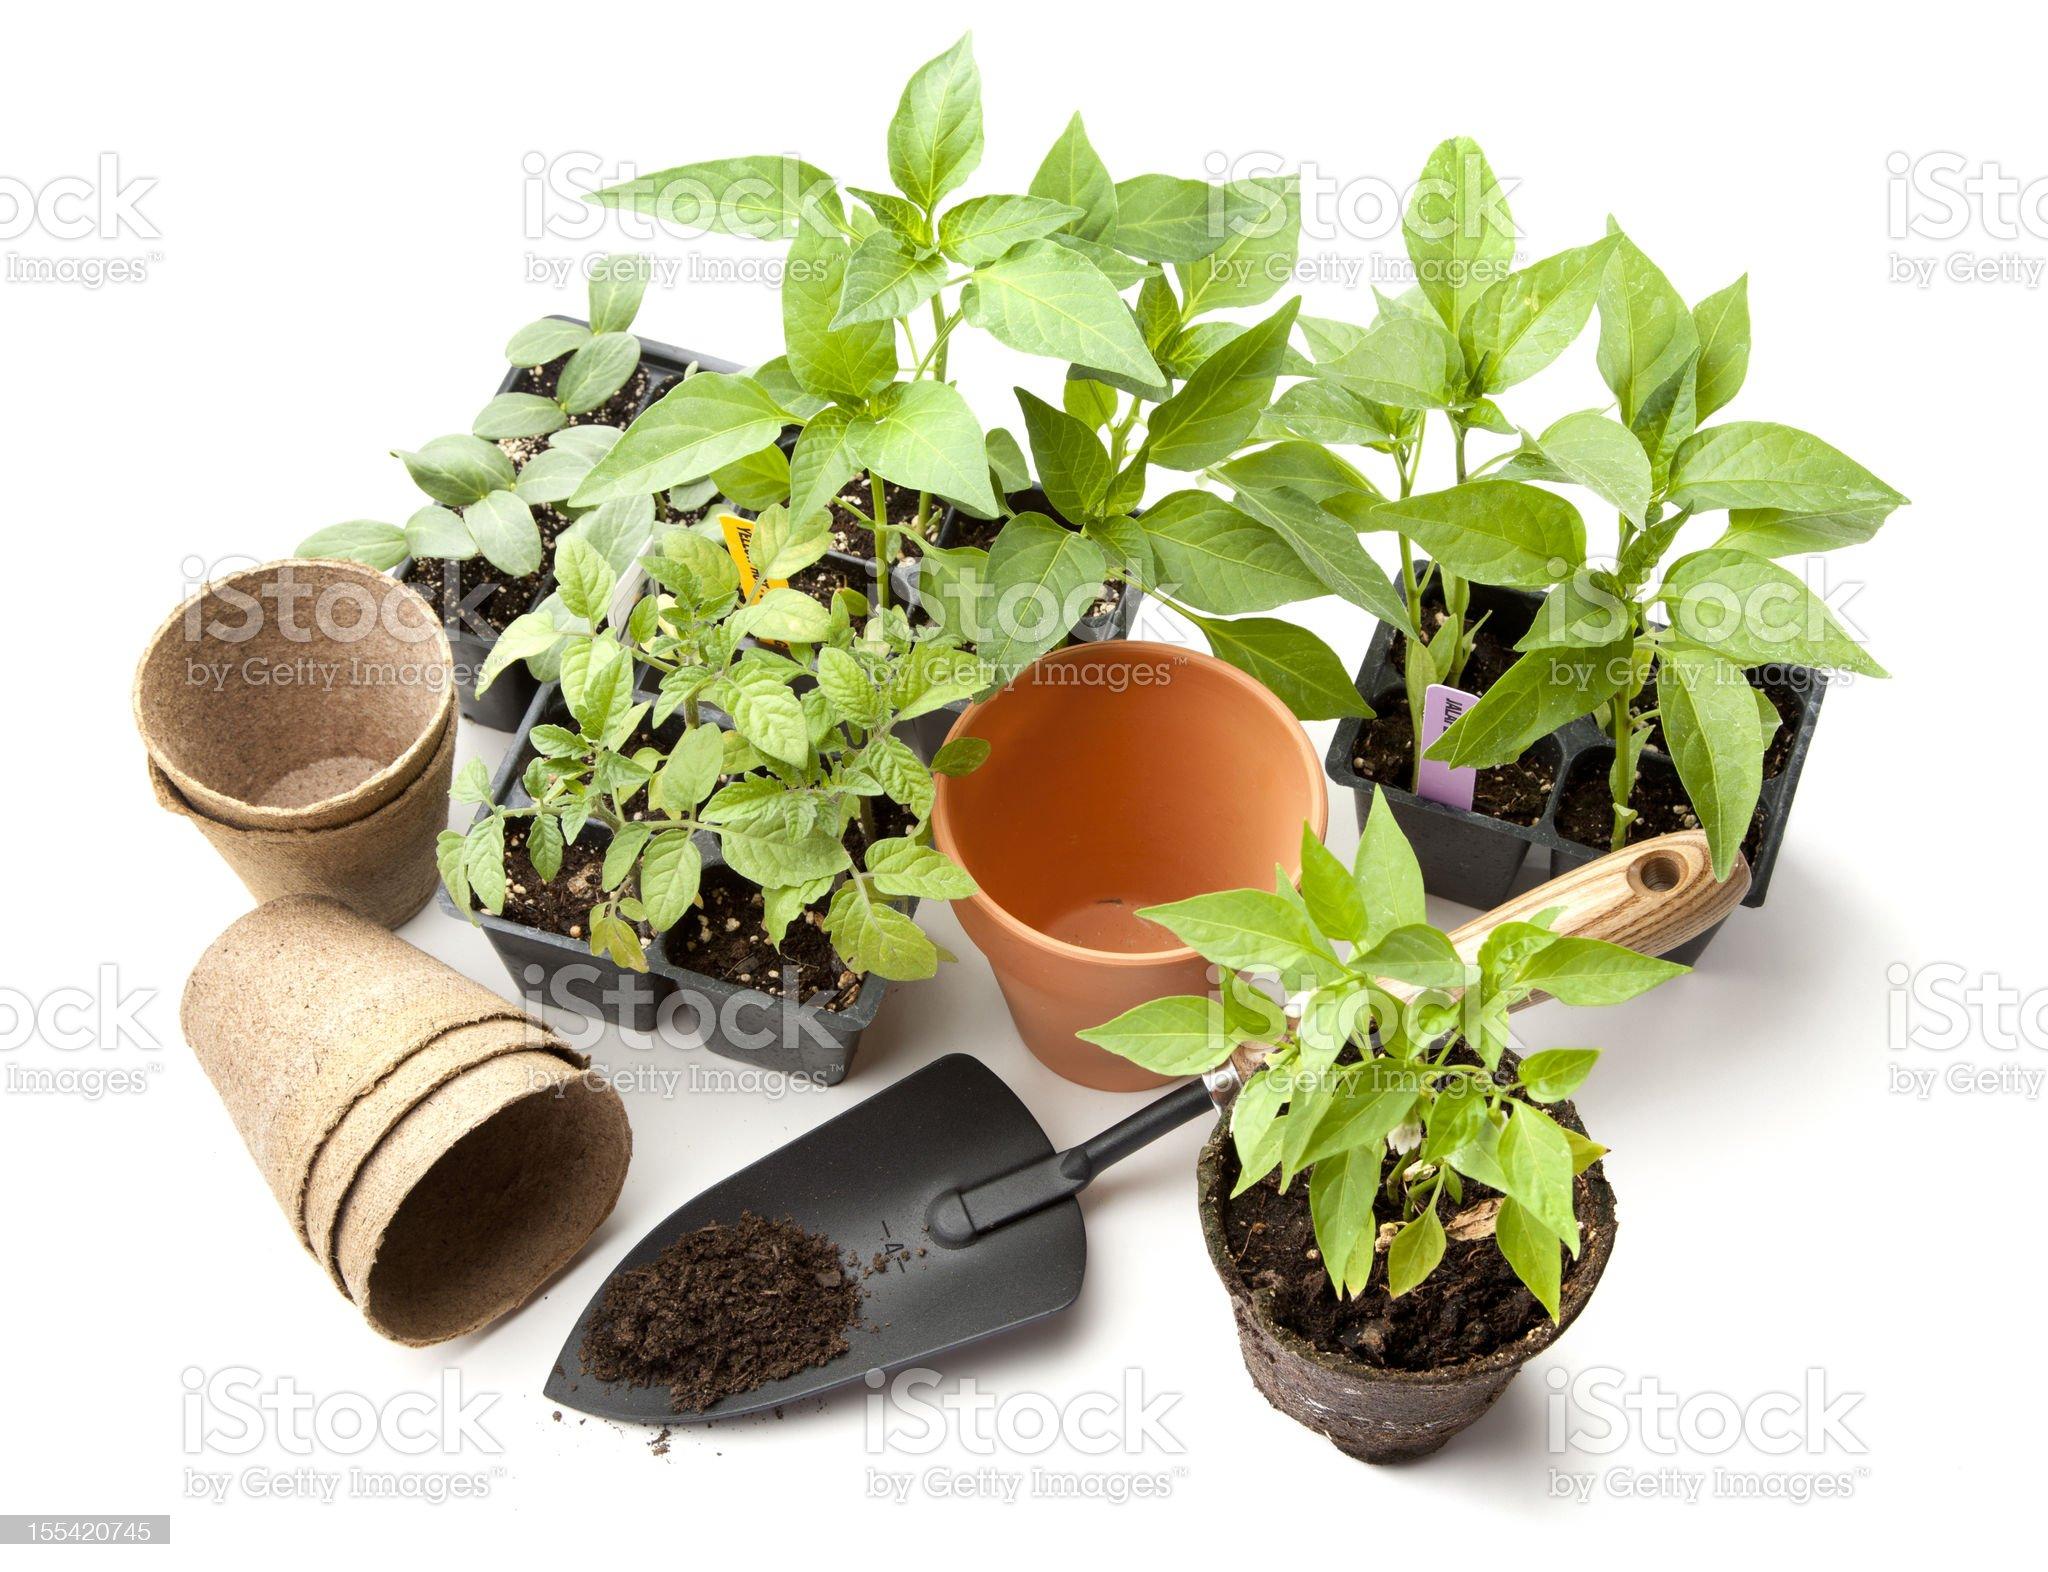 Vegetable Gardening Items royalty-free stock photo